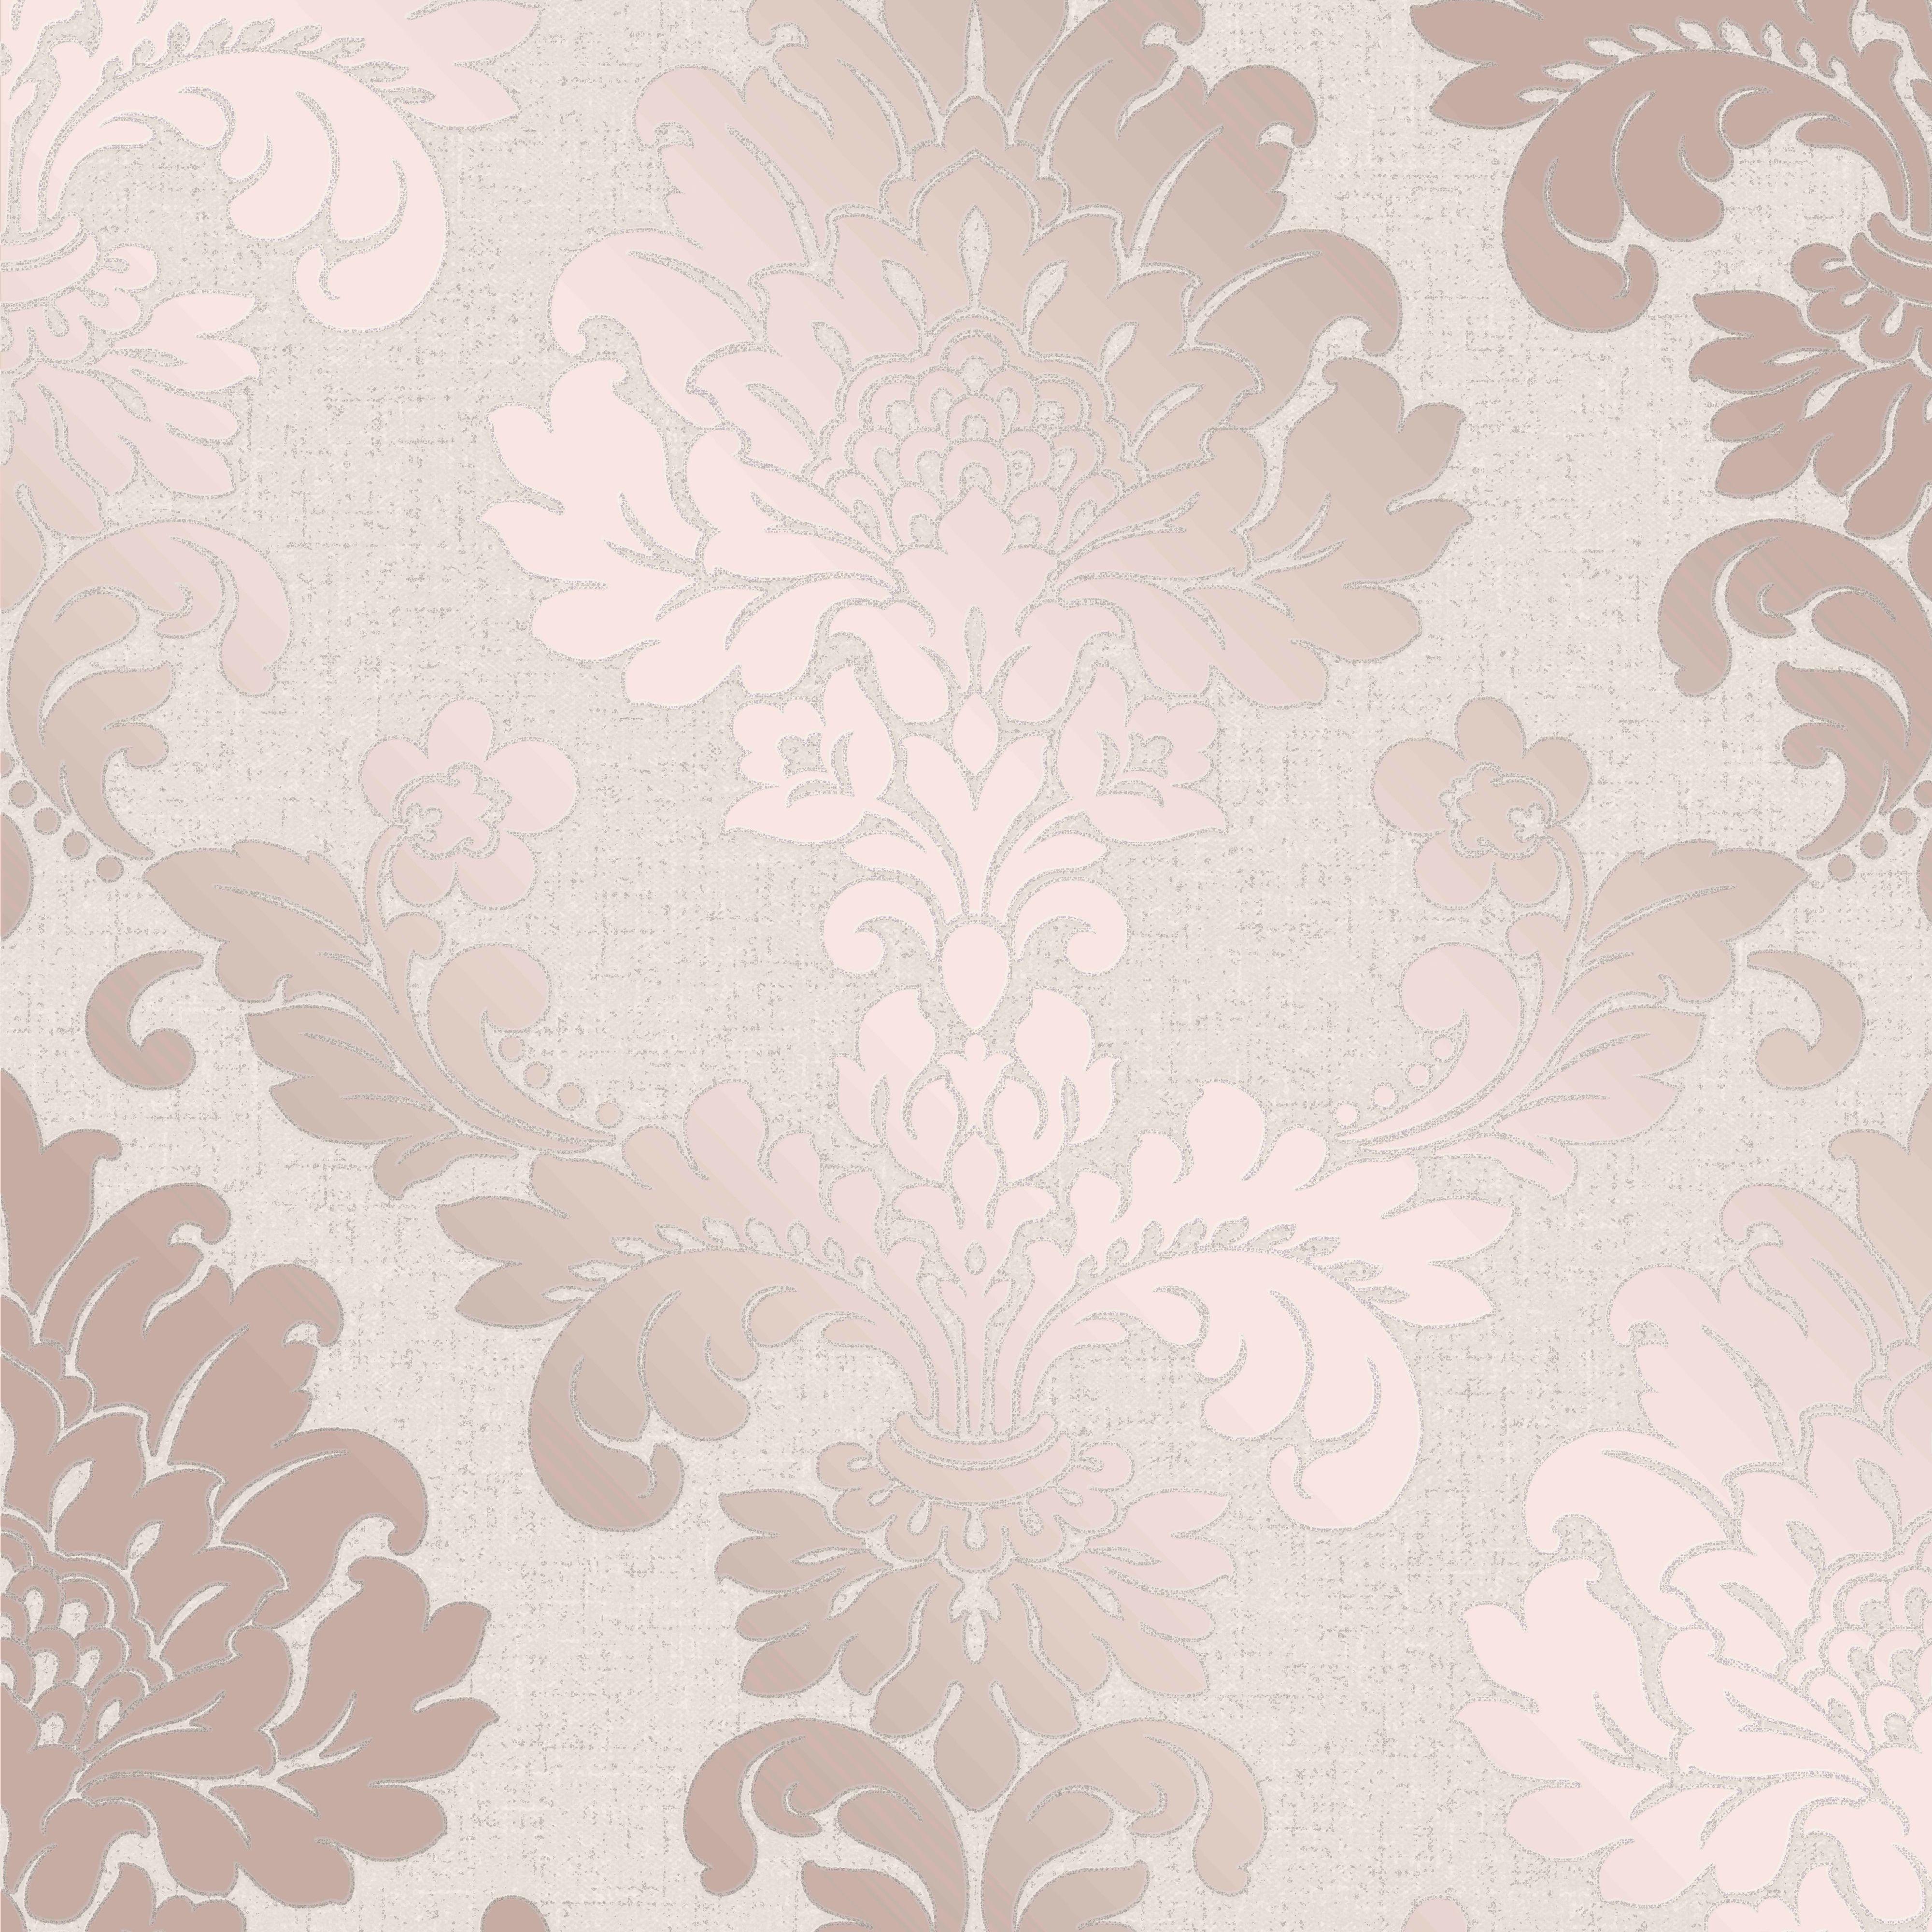 Fine Décor Rose Gold Damask Textured Wallpaper B&Q for